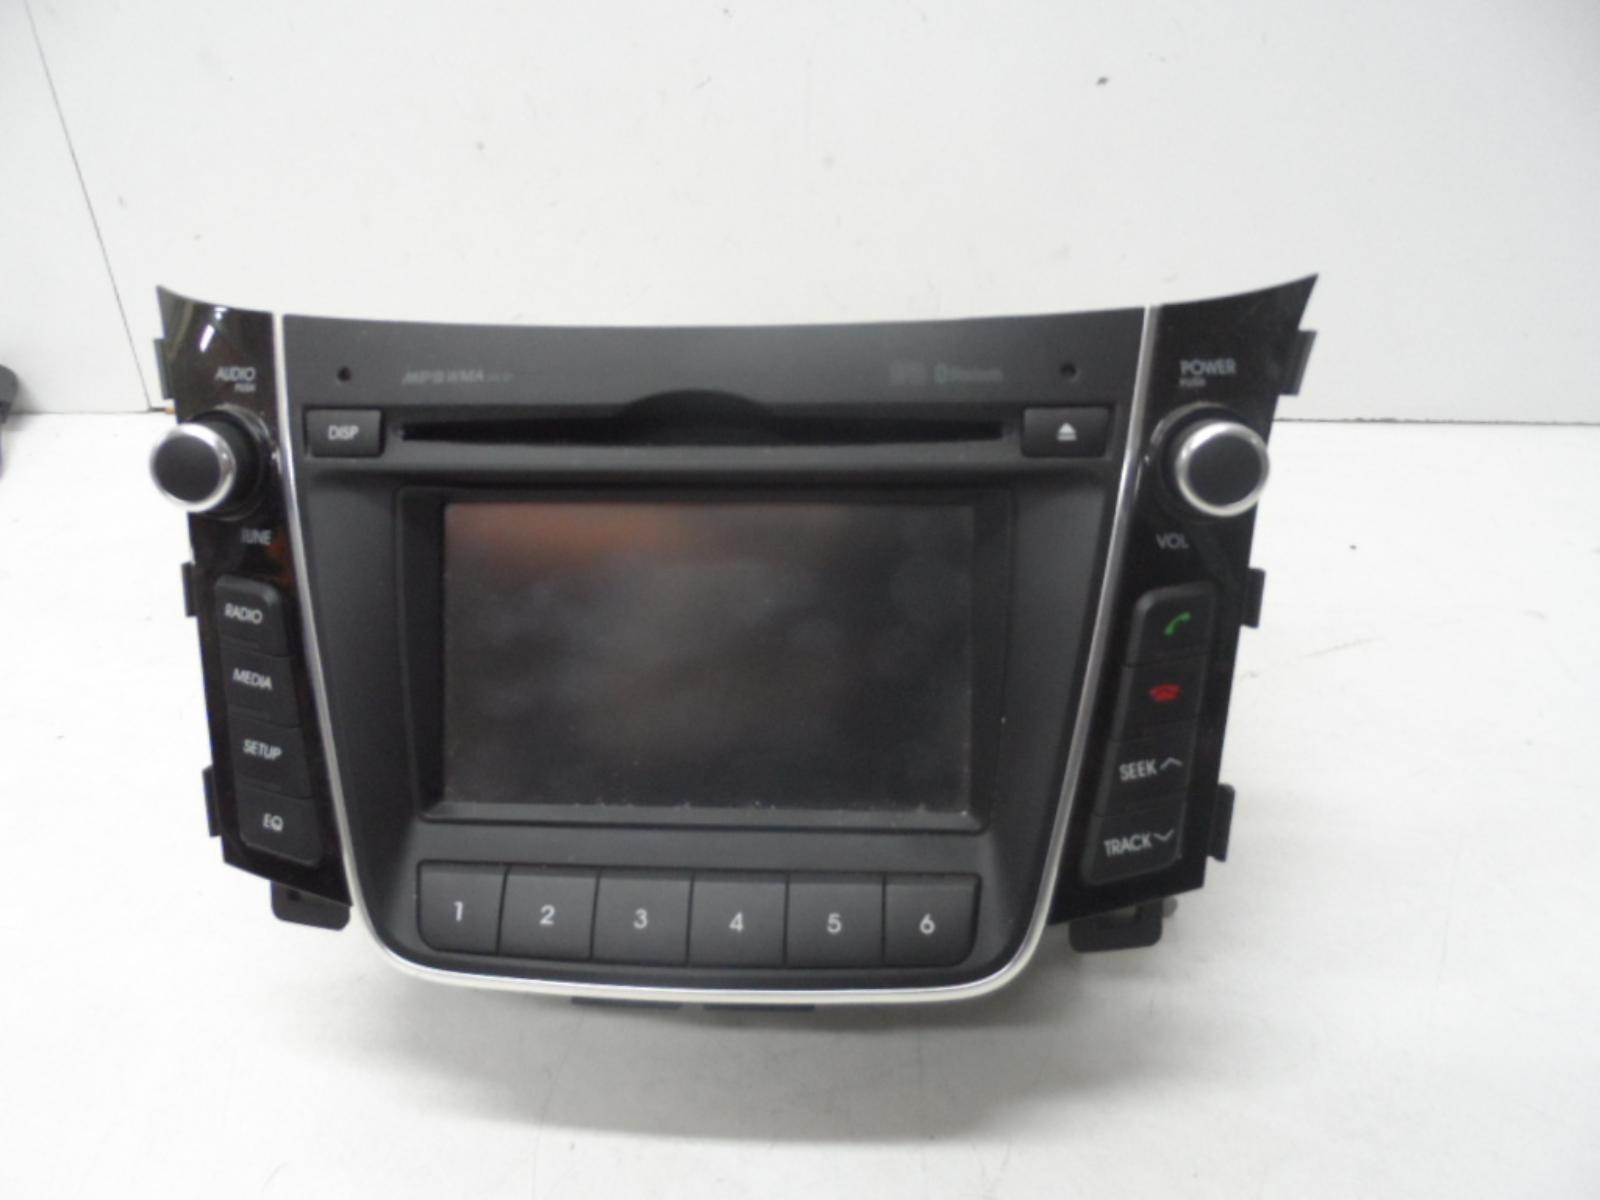 hyundai i30 radio cd player bluetooth type gd 05 12 12. Black Bedroom Furniture Sets. Home Design Ideas